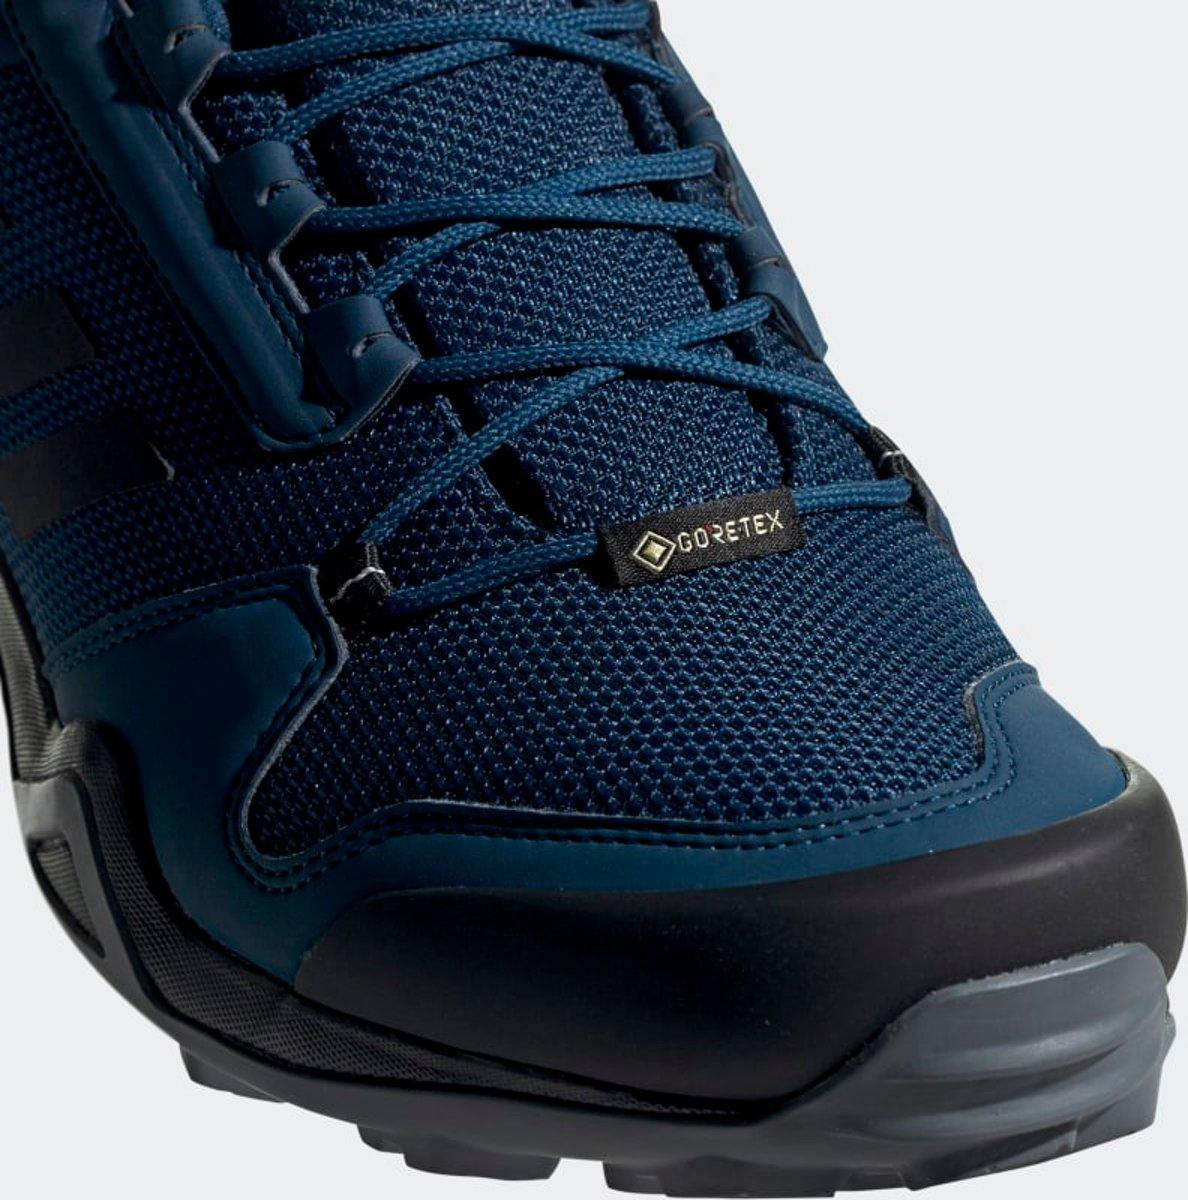 adidas Terrex AX3 GTX wandelschoenen heren blauwzwart